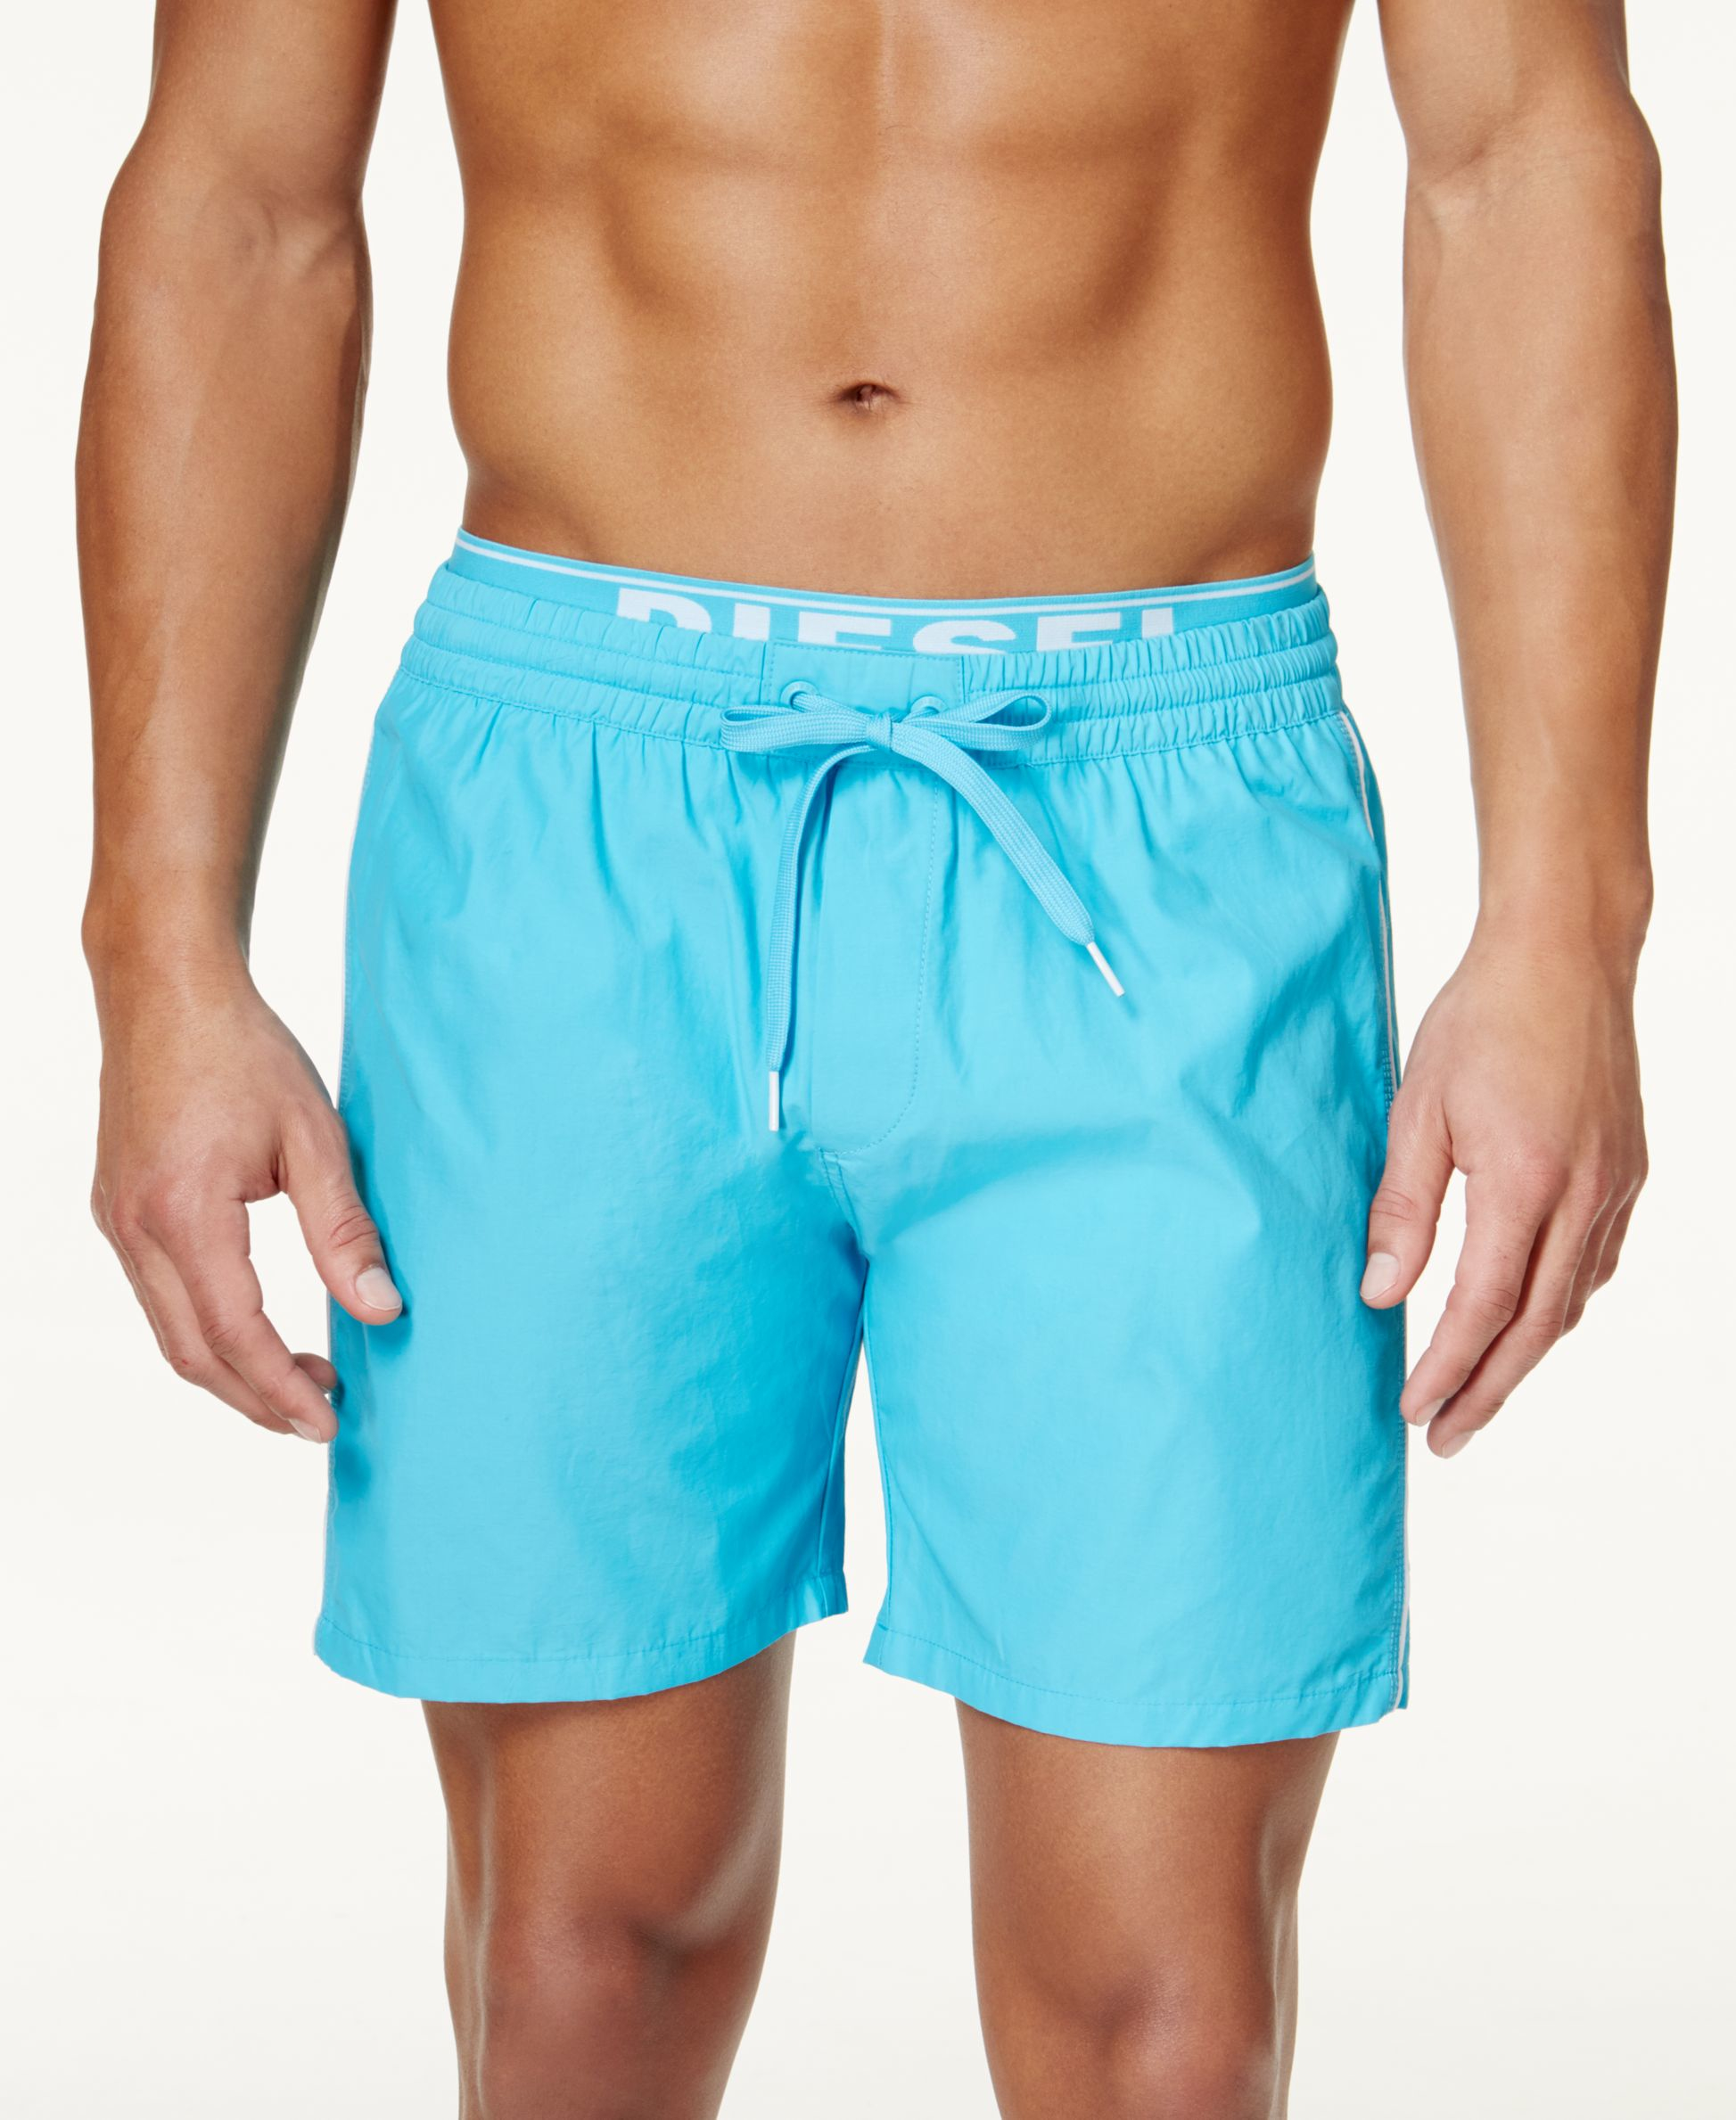 97decec804a22a DIESEL Men's Bmbx Dolphin-e Solid Swim Shorts in Blue for Men - Lyst